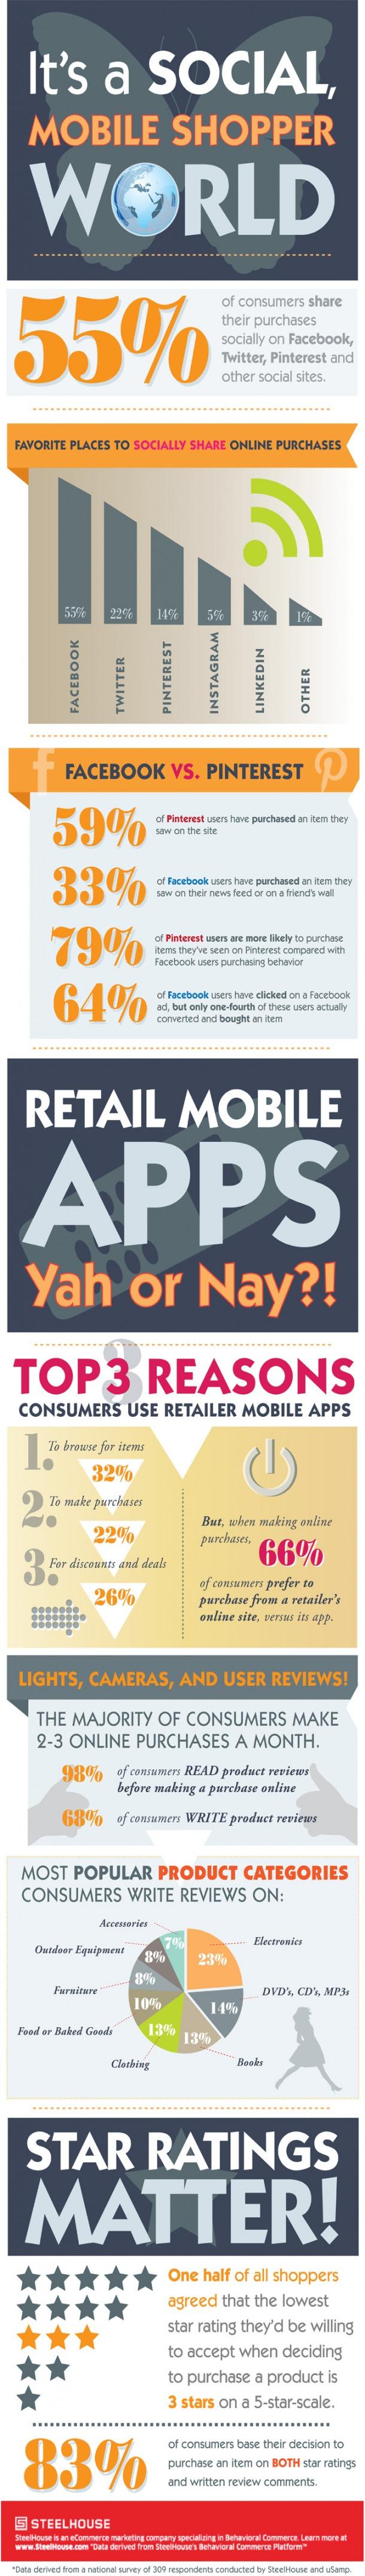 It's A Social Mobile Shopper World[INFOGRAPHIC]